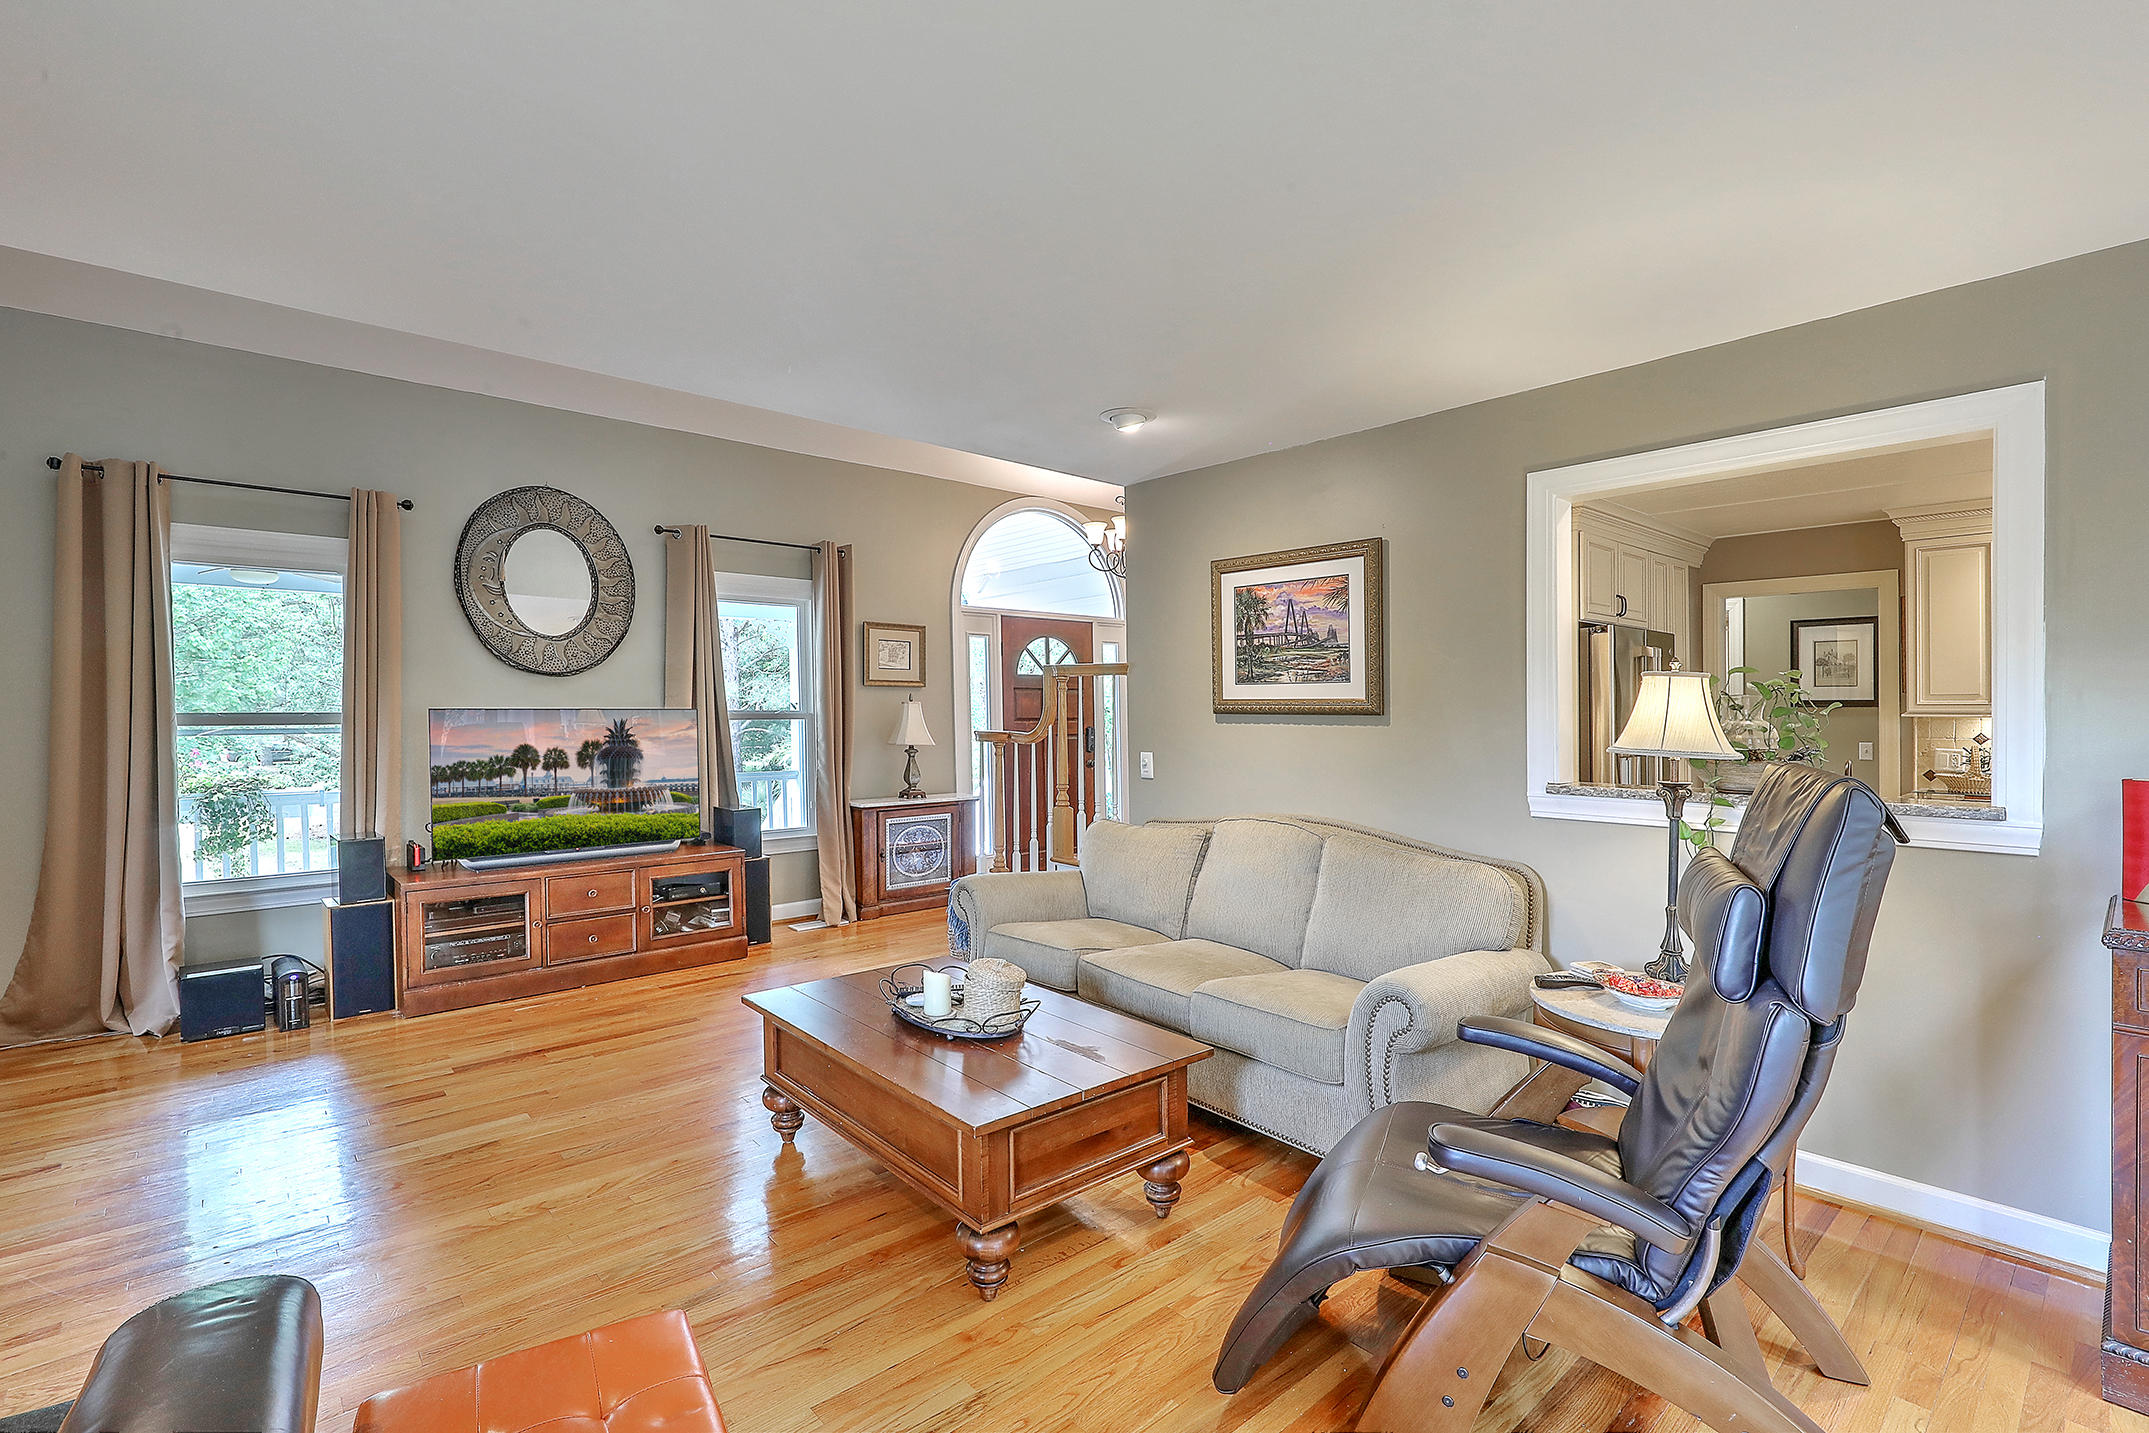 Stono Pointe Homes For Sale - 2660 Burden Creek, Johns Island, SC - 59